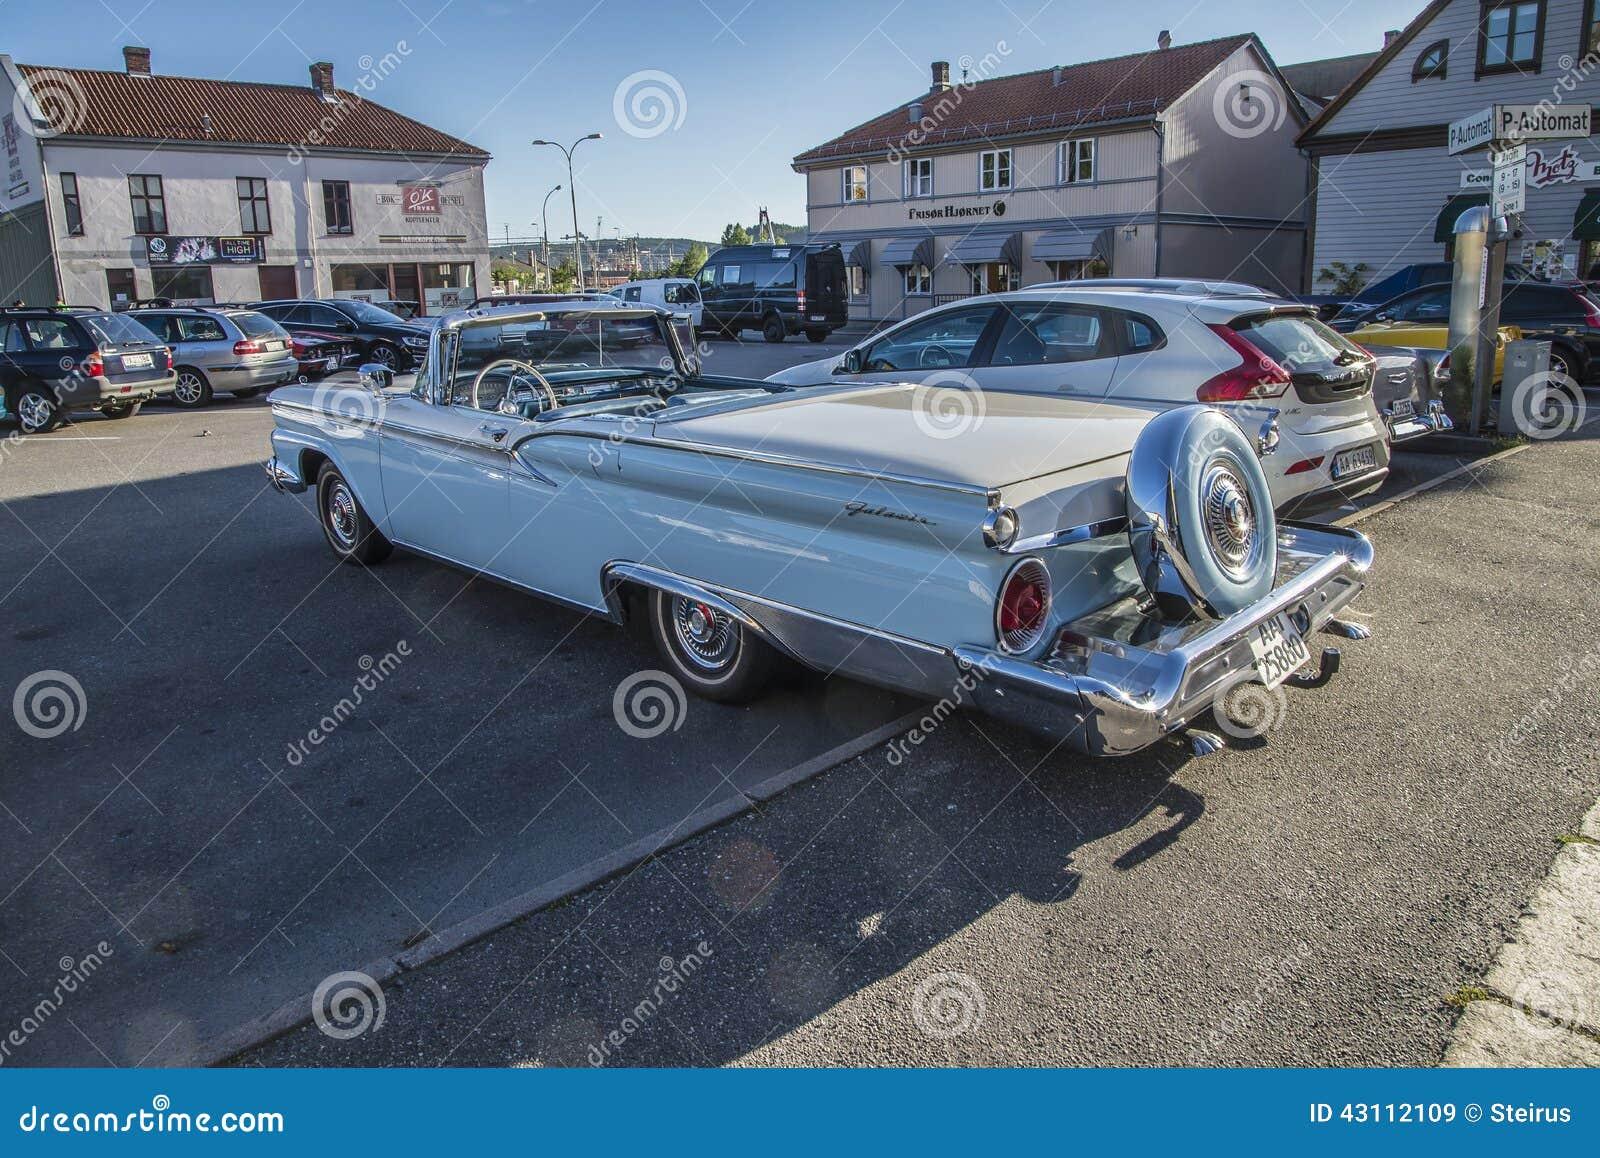 1959 Ford Fairlane 500 Galaxie Convertible Editorial Stock